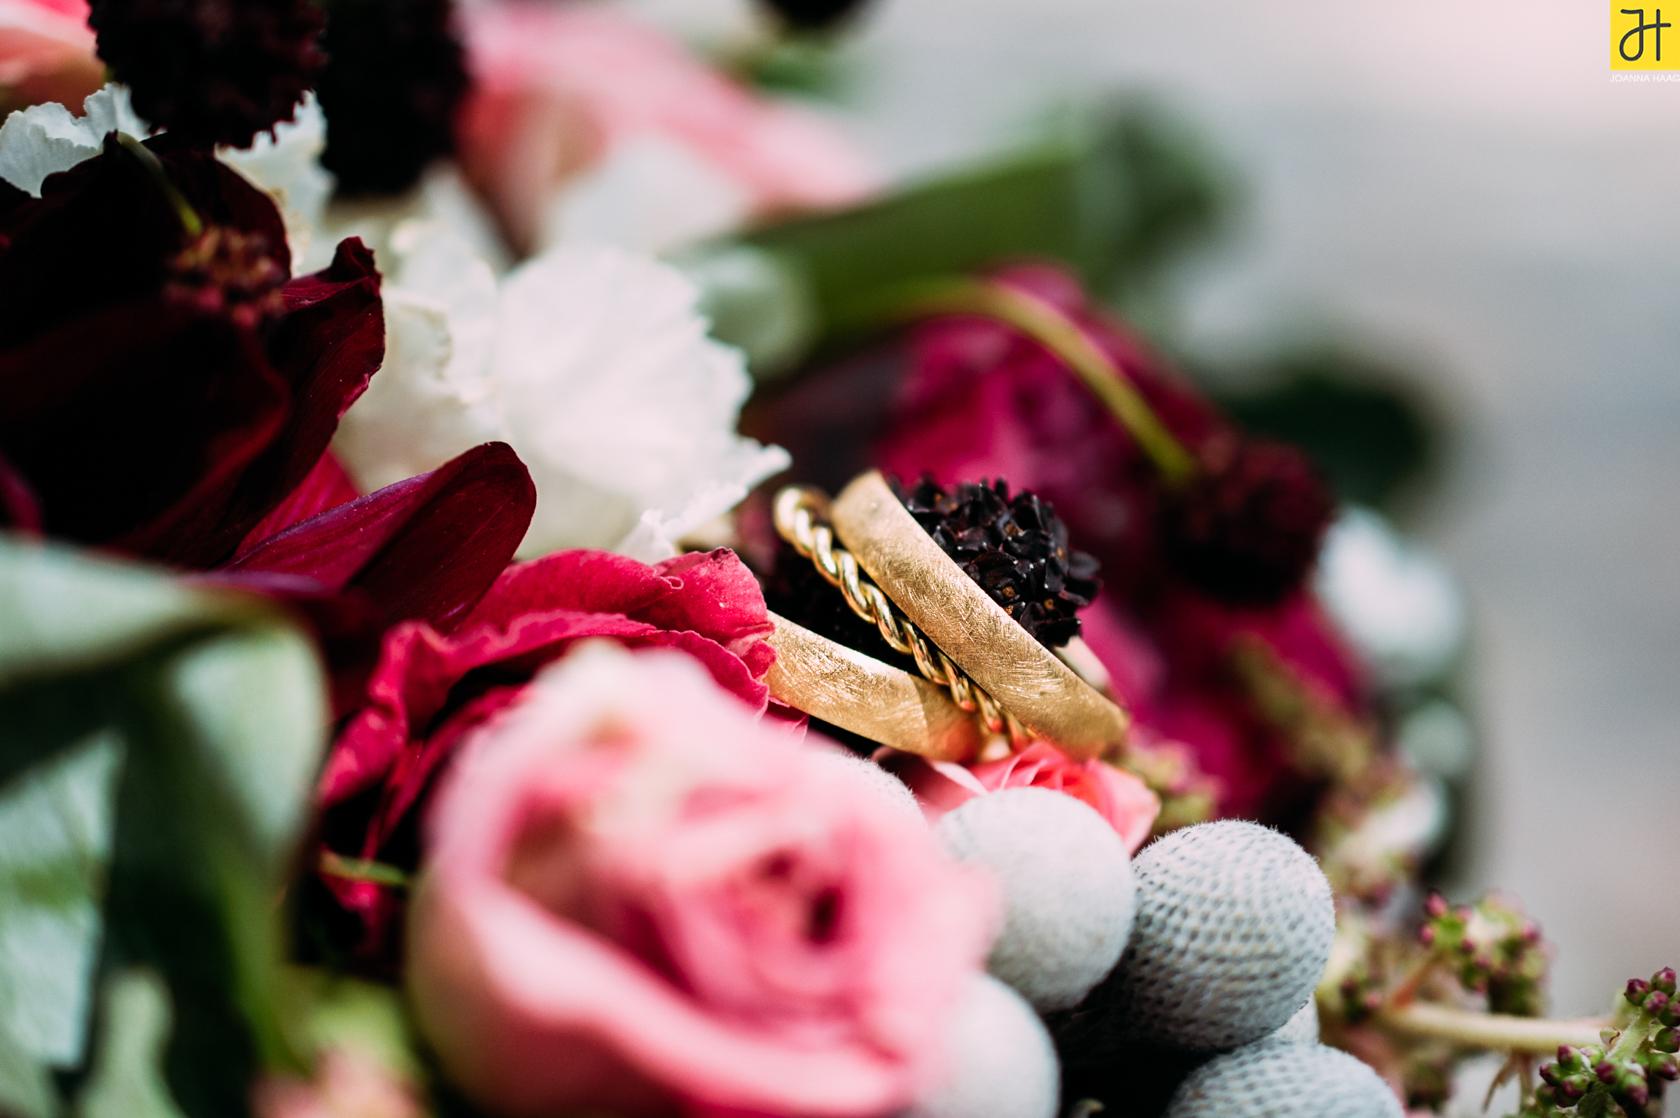 © JOANNA HAAG / #Hochzeit #Brautpaarshooting #Brautpaar #Villingen #Eheringe